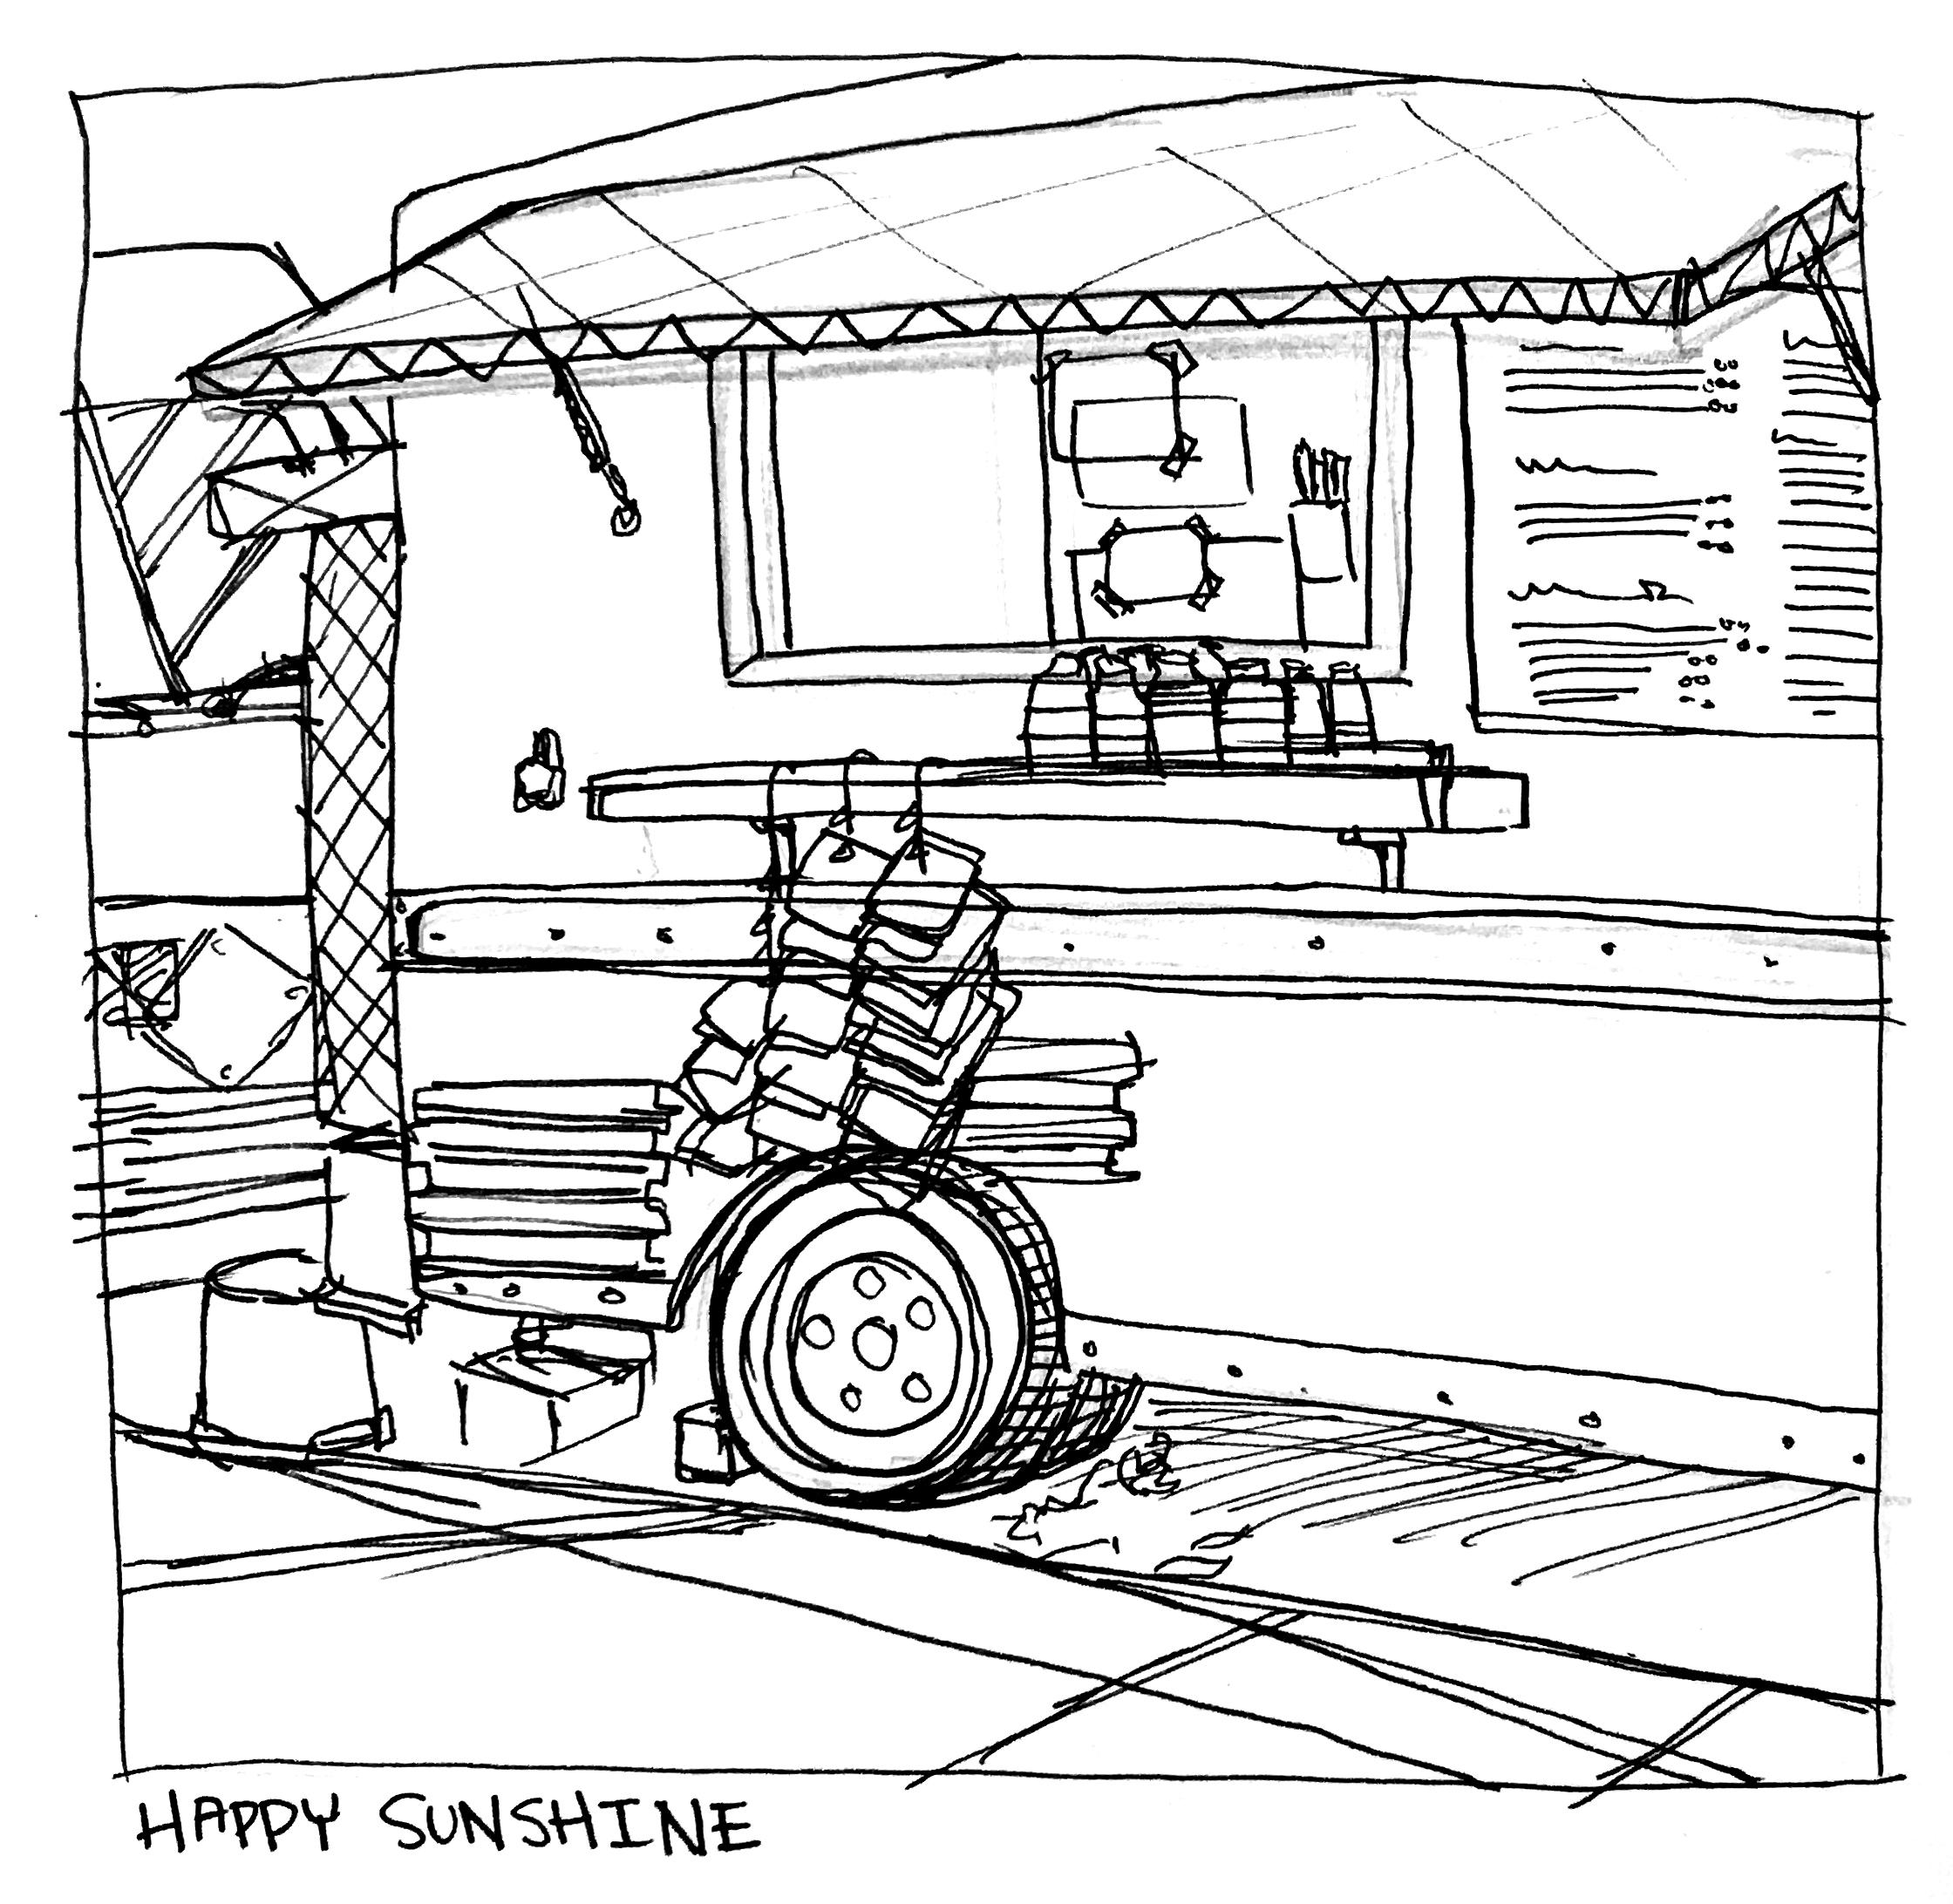 Happy SUnshine.jpg